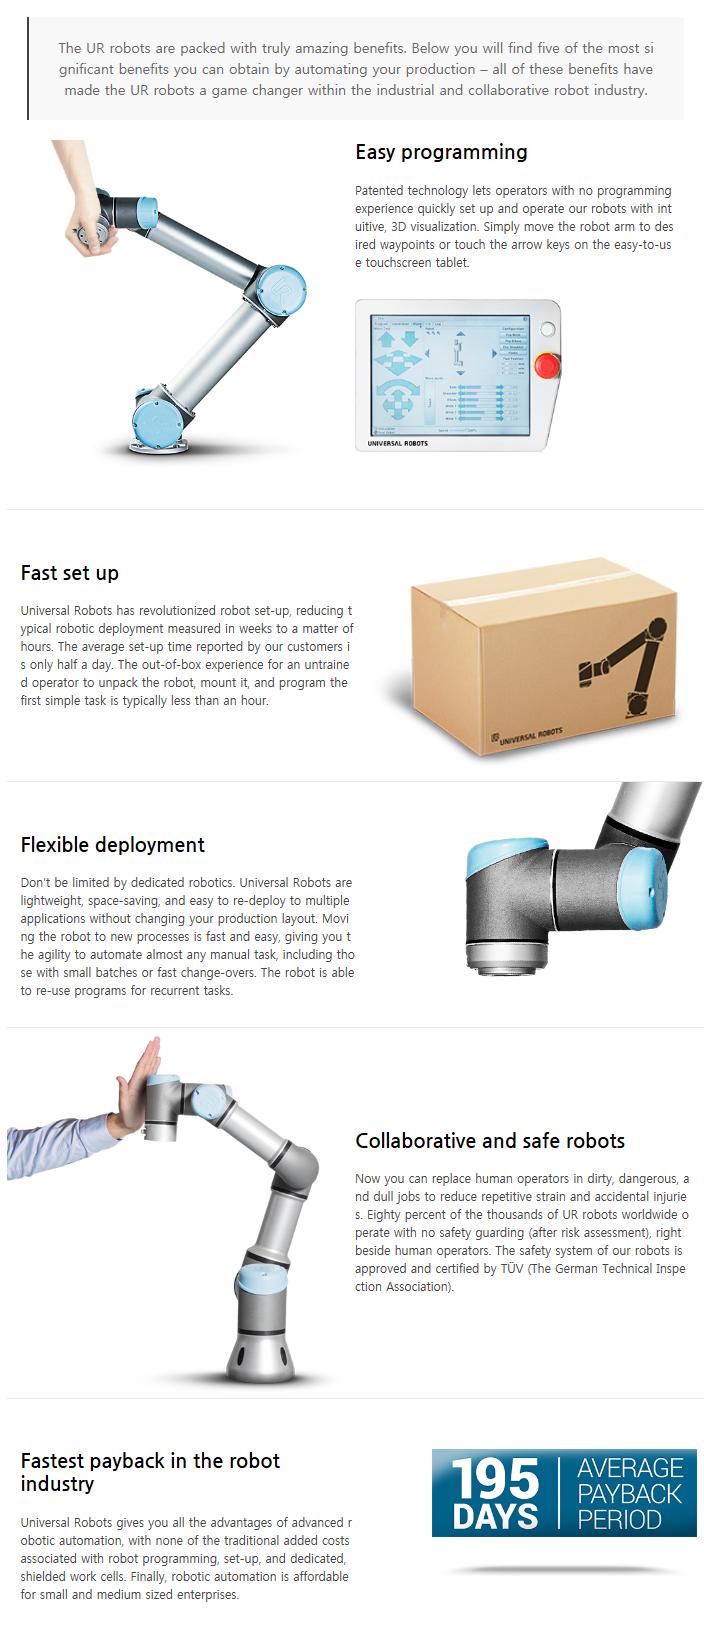 VISION SEMICON UR Robot Benefits